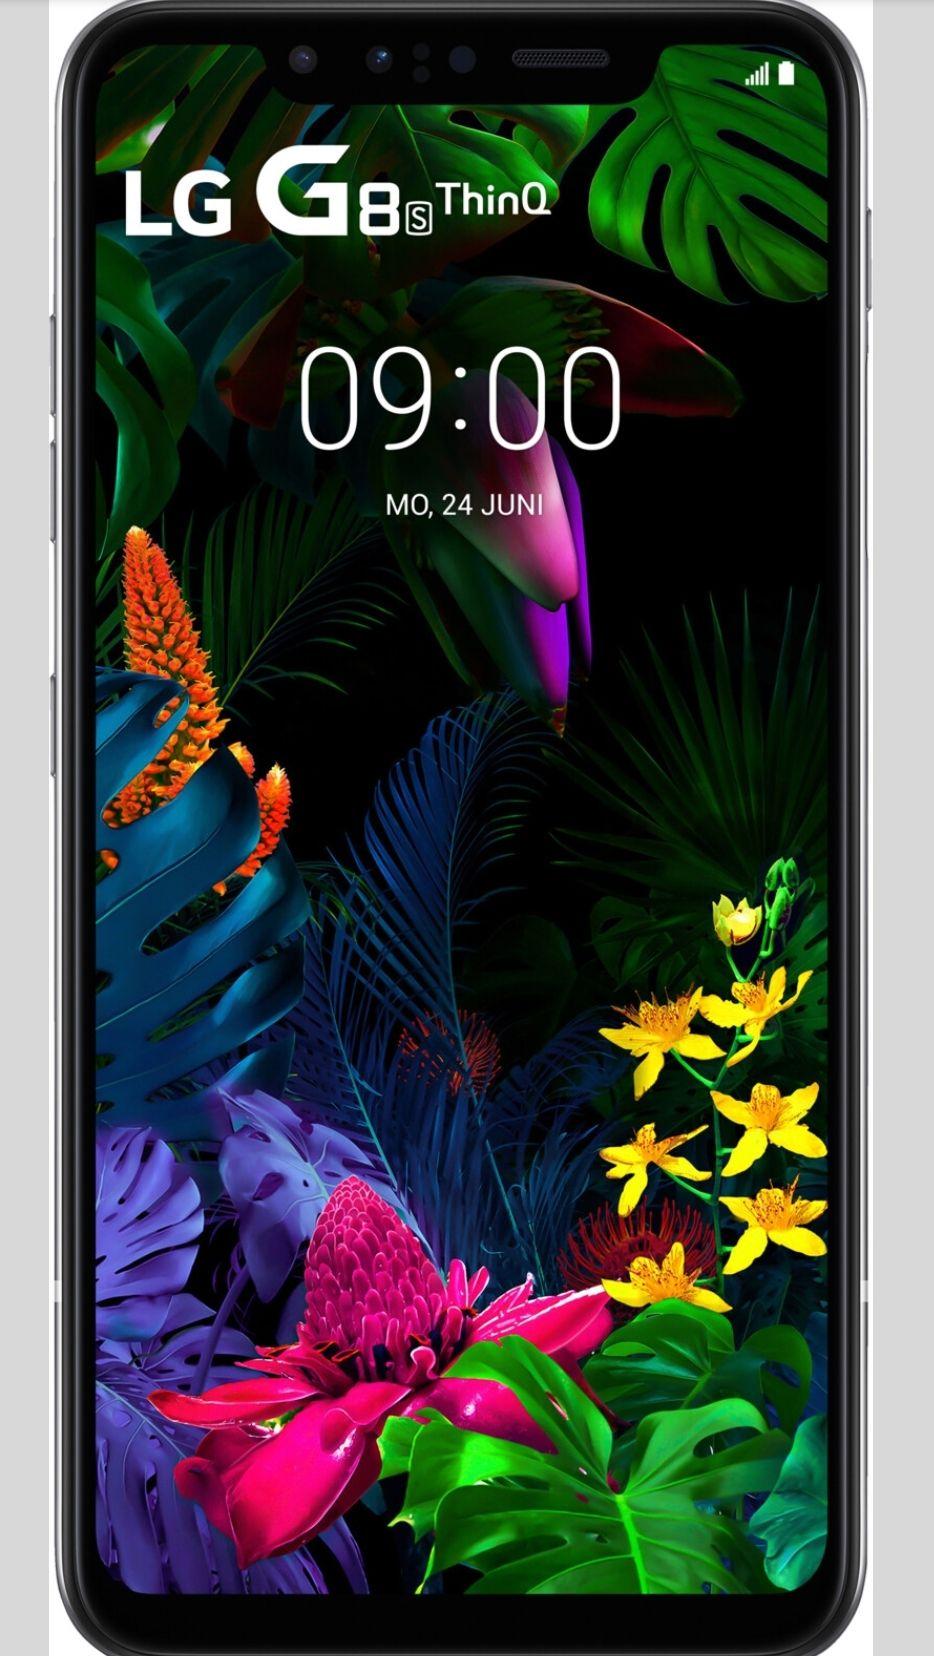 [Saturn ebay] LG G8s ThinQ, 128 GB, Mirror White